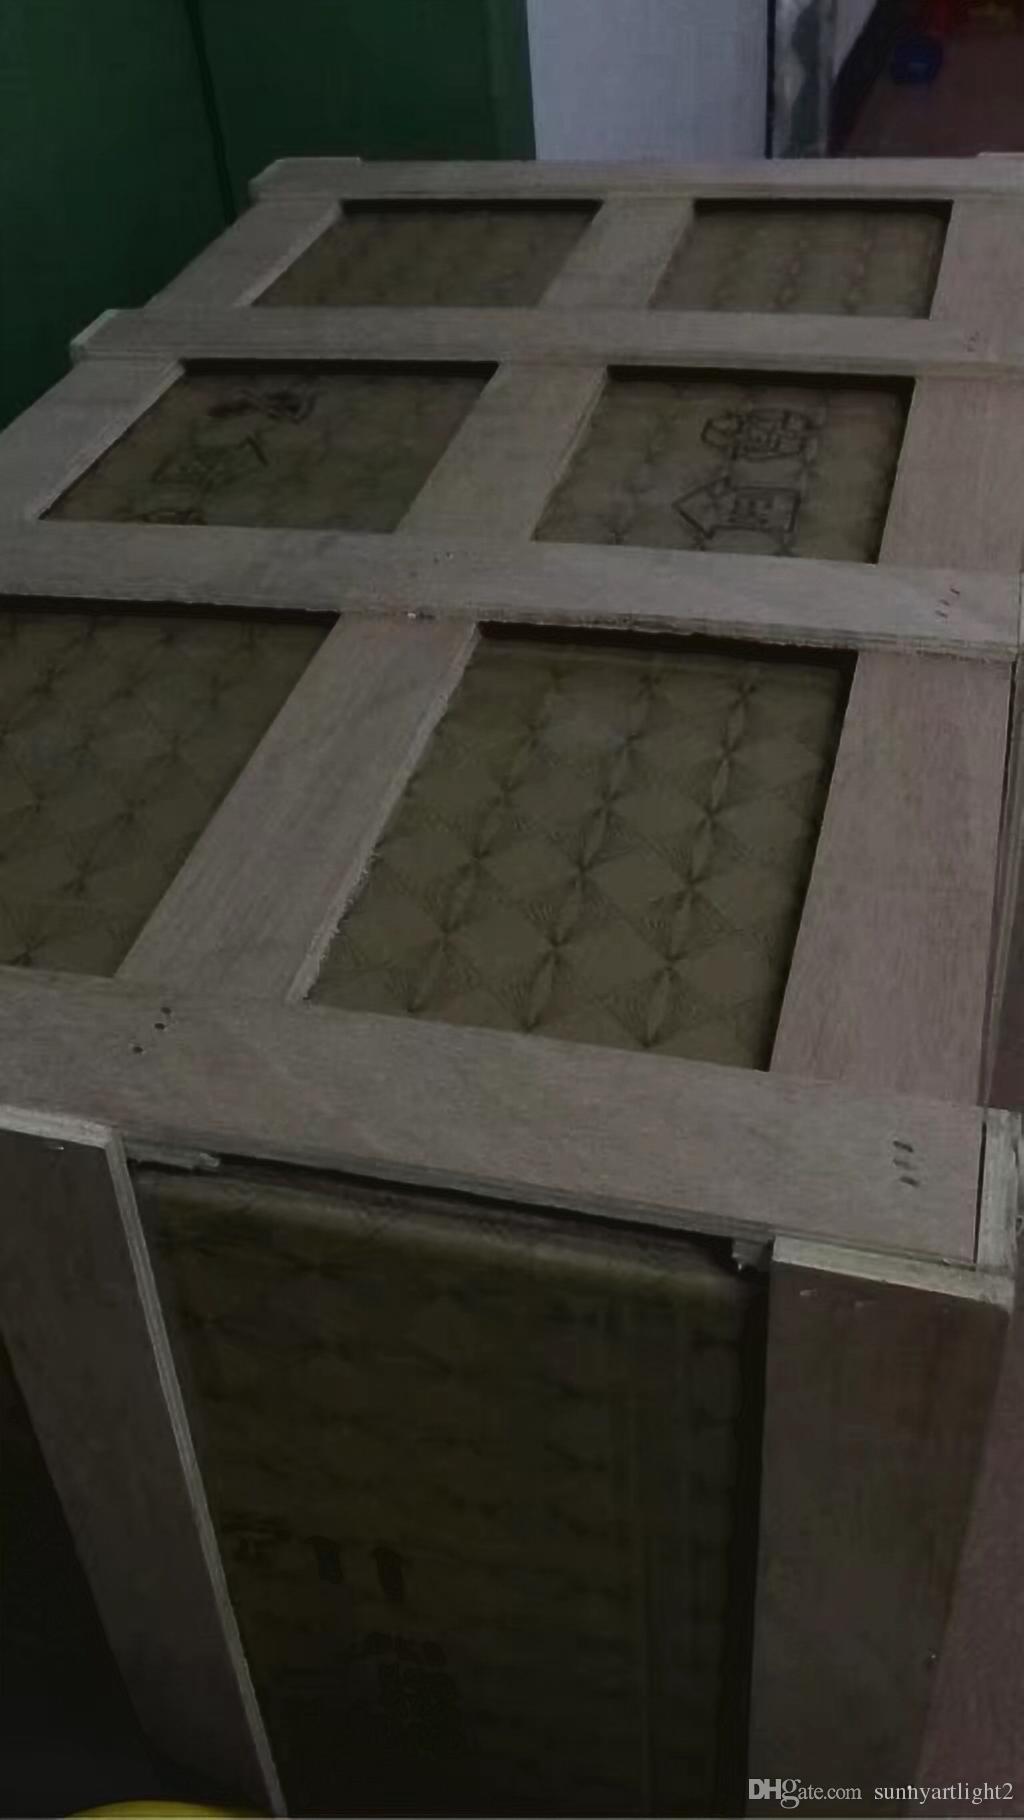 Vidro colorido Murano Lâmpadas Turco frete grátis Art Chandelier Modern Art Borosilicate decorativa Vidro para Hotel Decor